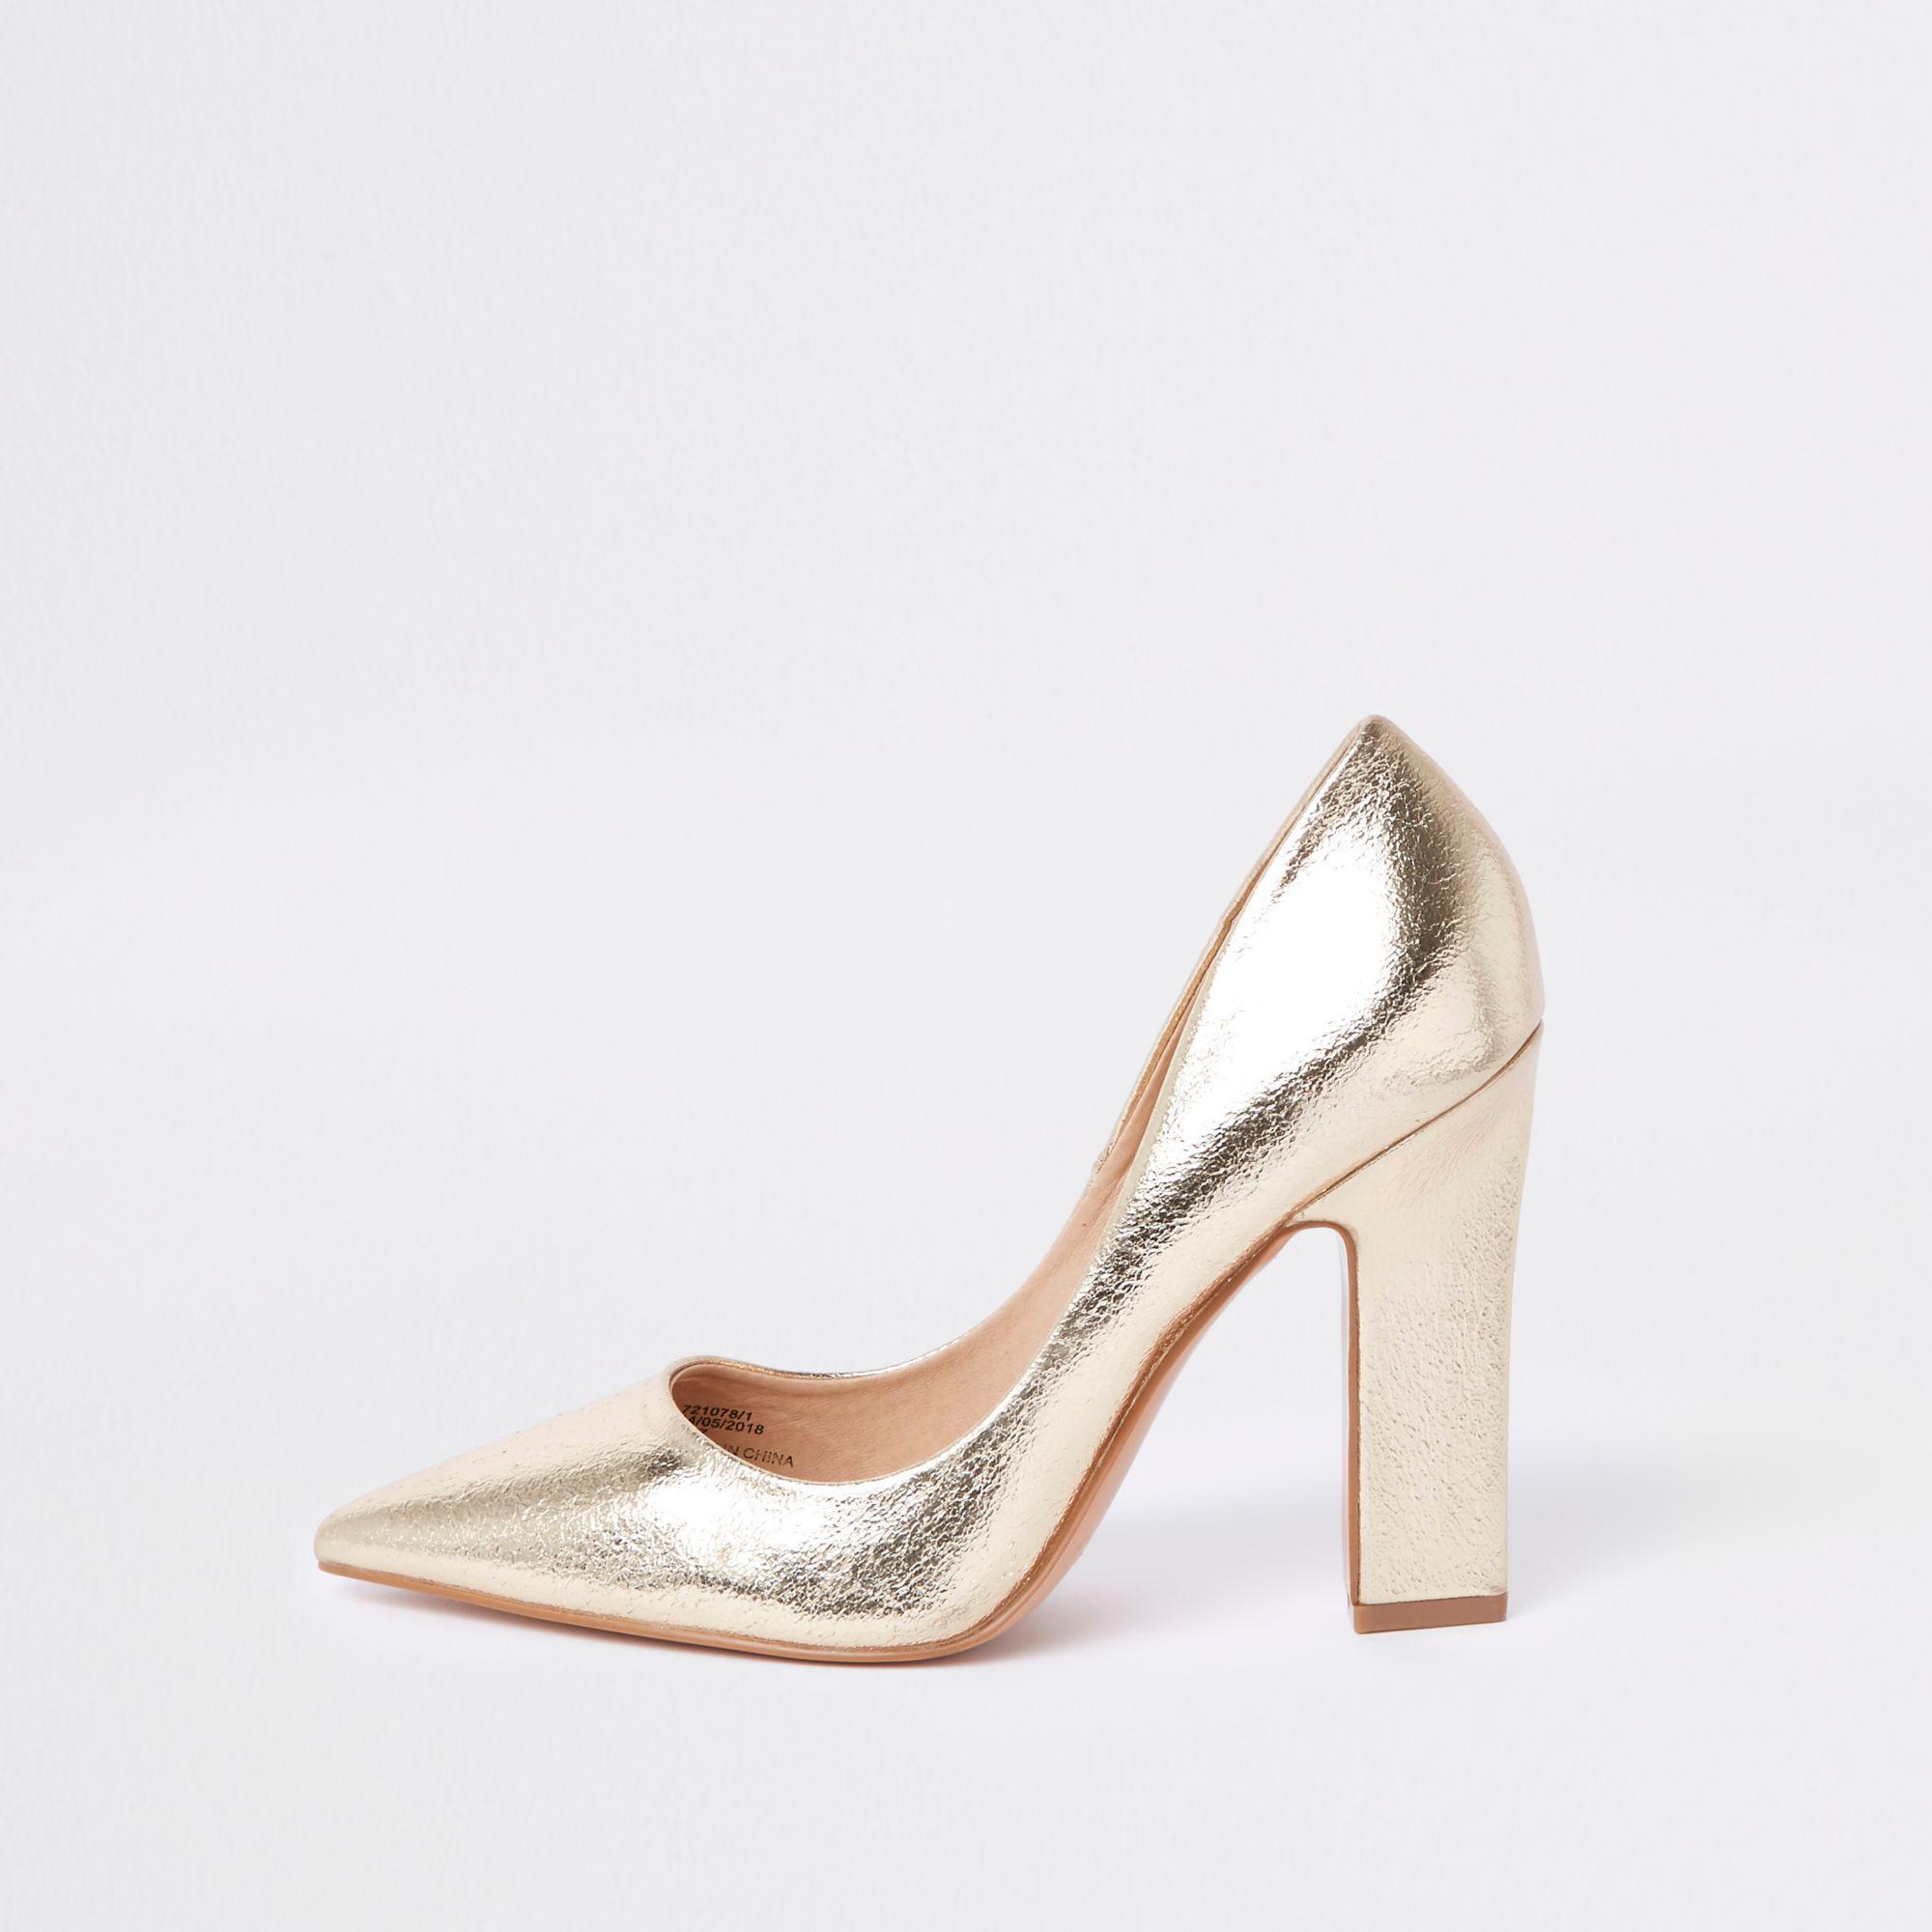 84a16e419b0 River Island Metallic Court Shoes in Metallic - Lyst